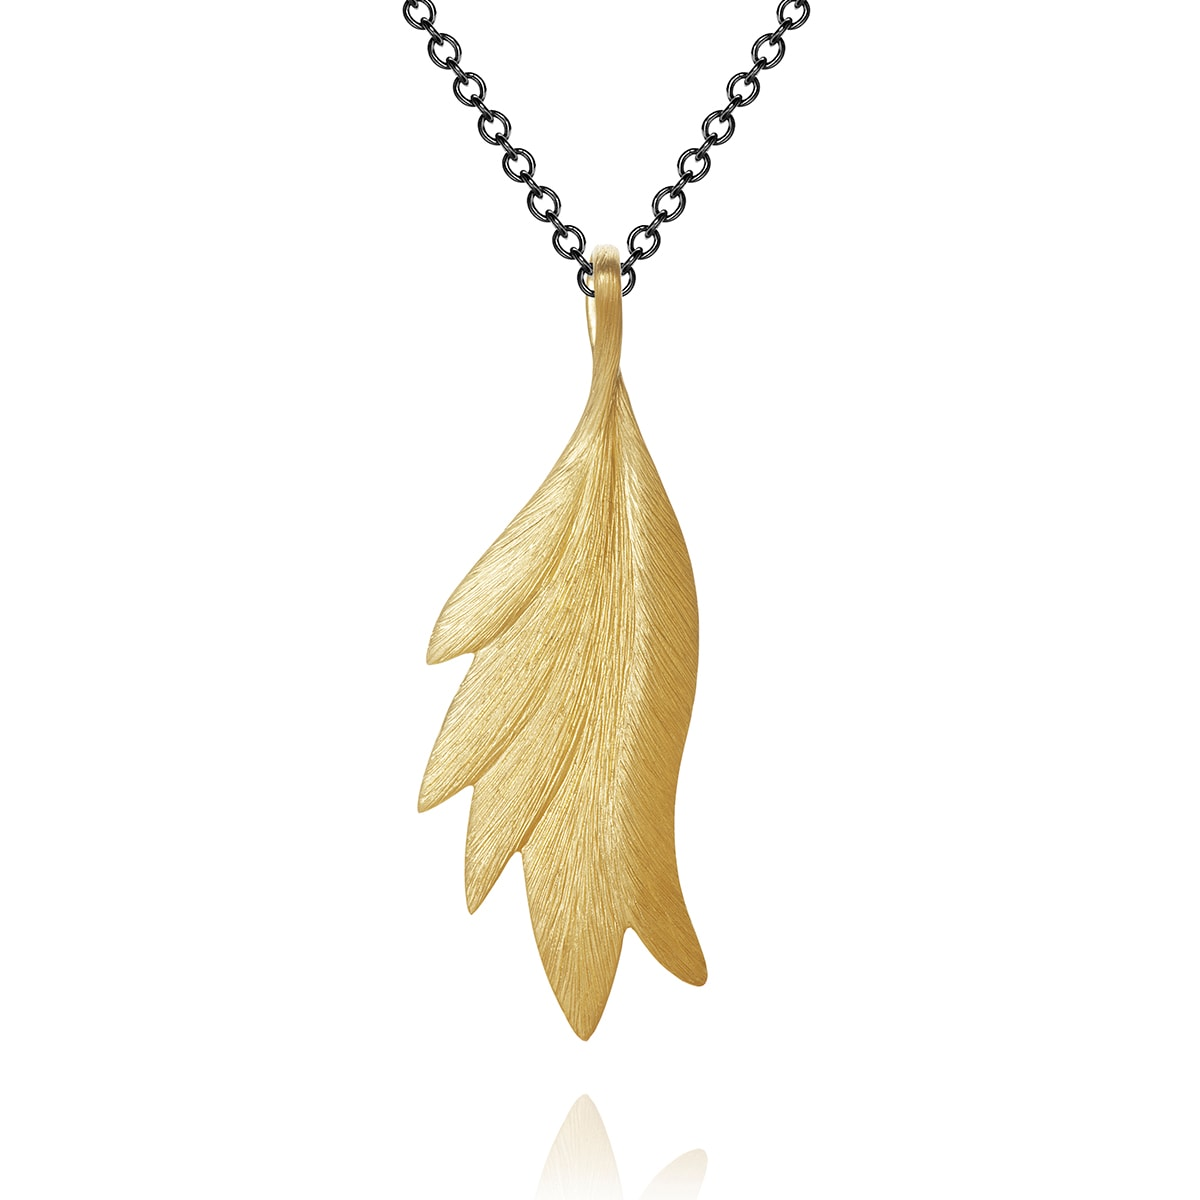 Dulong, Fine Jewelry_Aura_Guldhänge_AUR5-A1070_hos_Jarl_Sandin